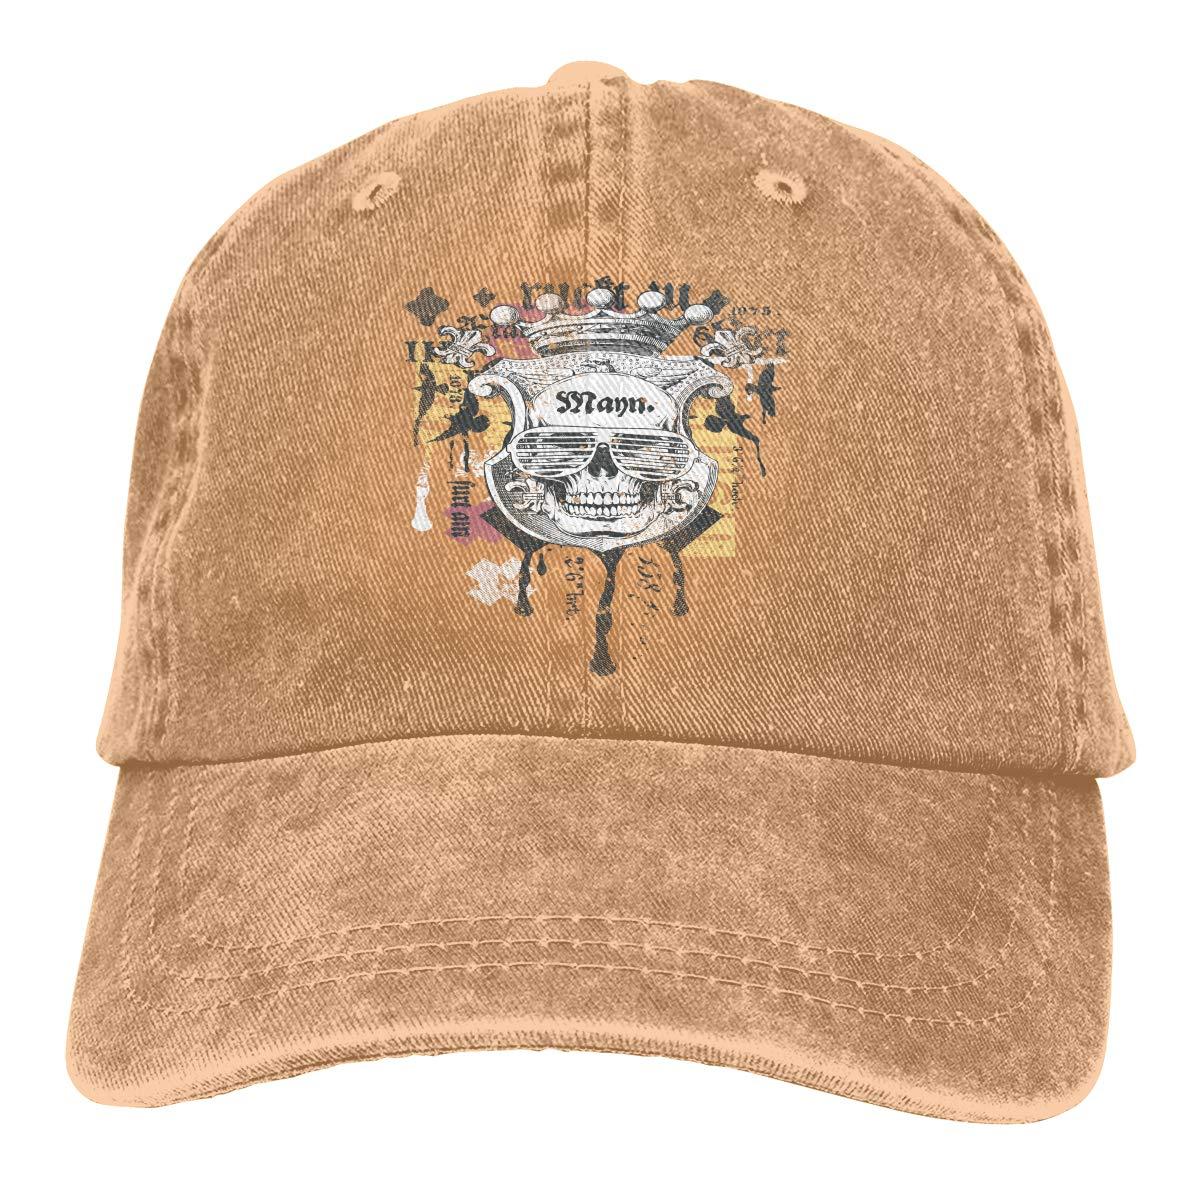 outlet on sale Sunglasses Skull Cowboy Hat Dad Hats Ball Denim ...